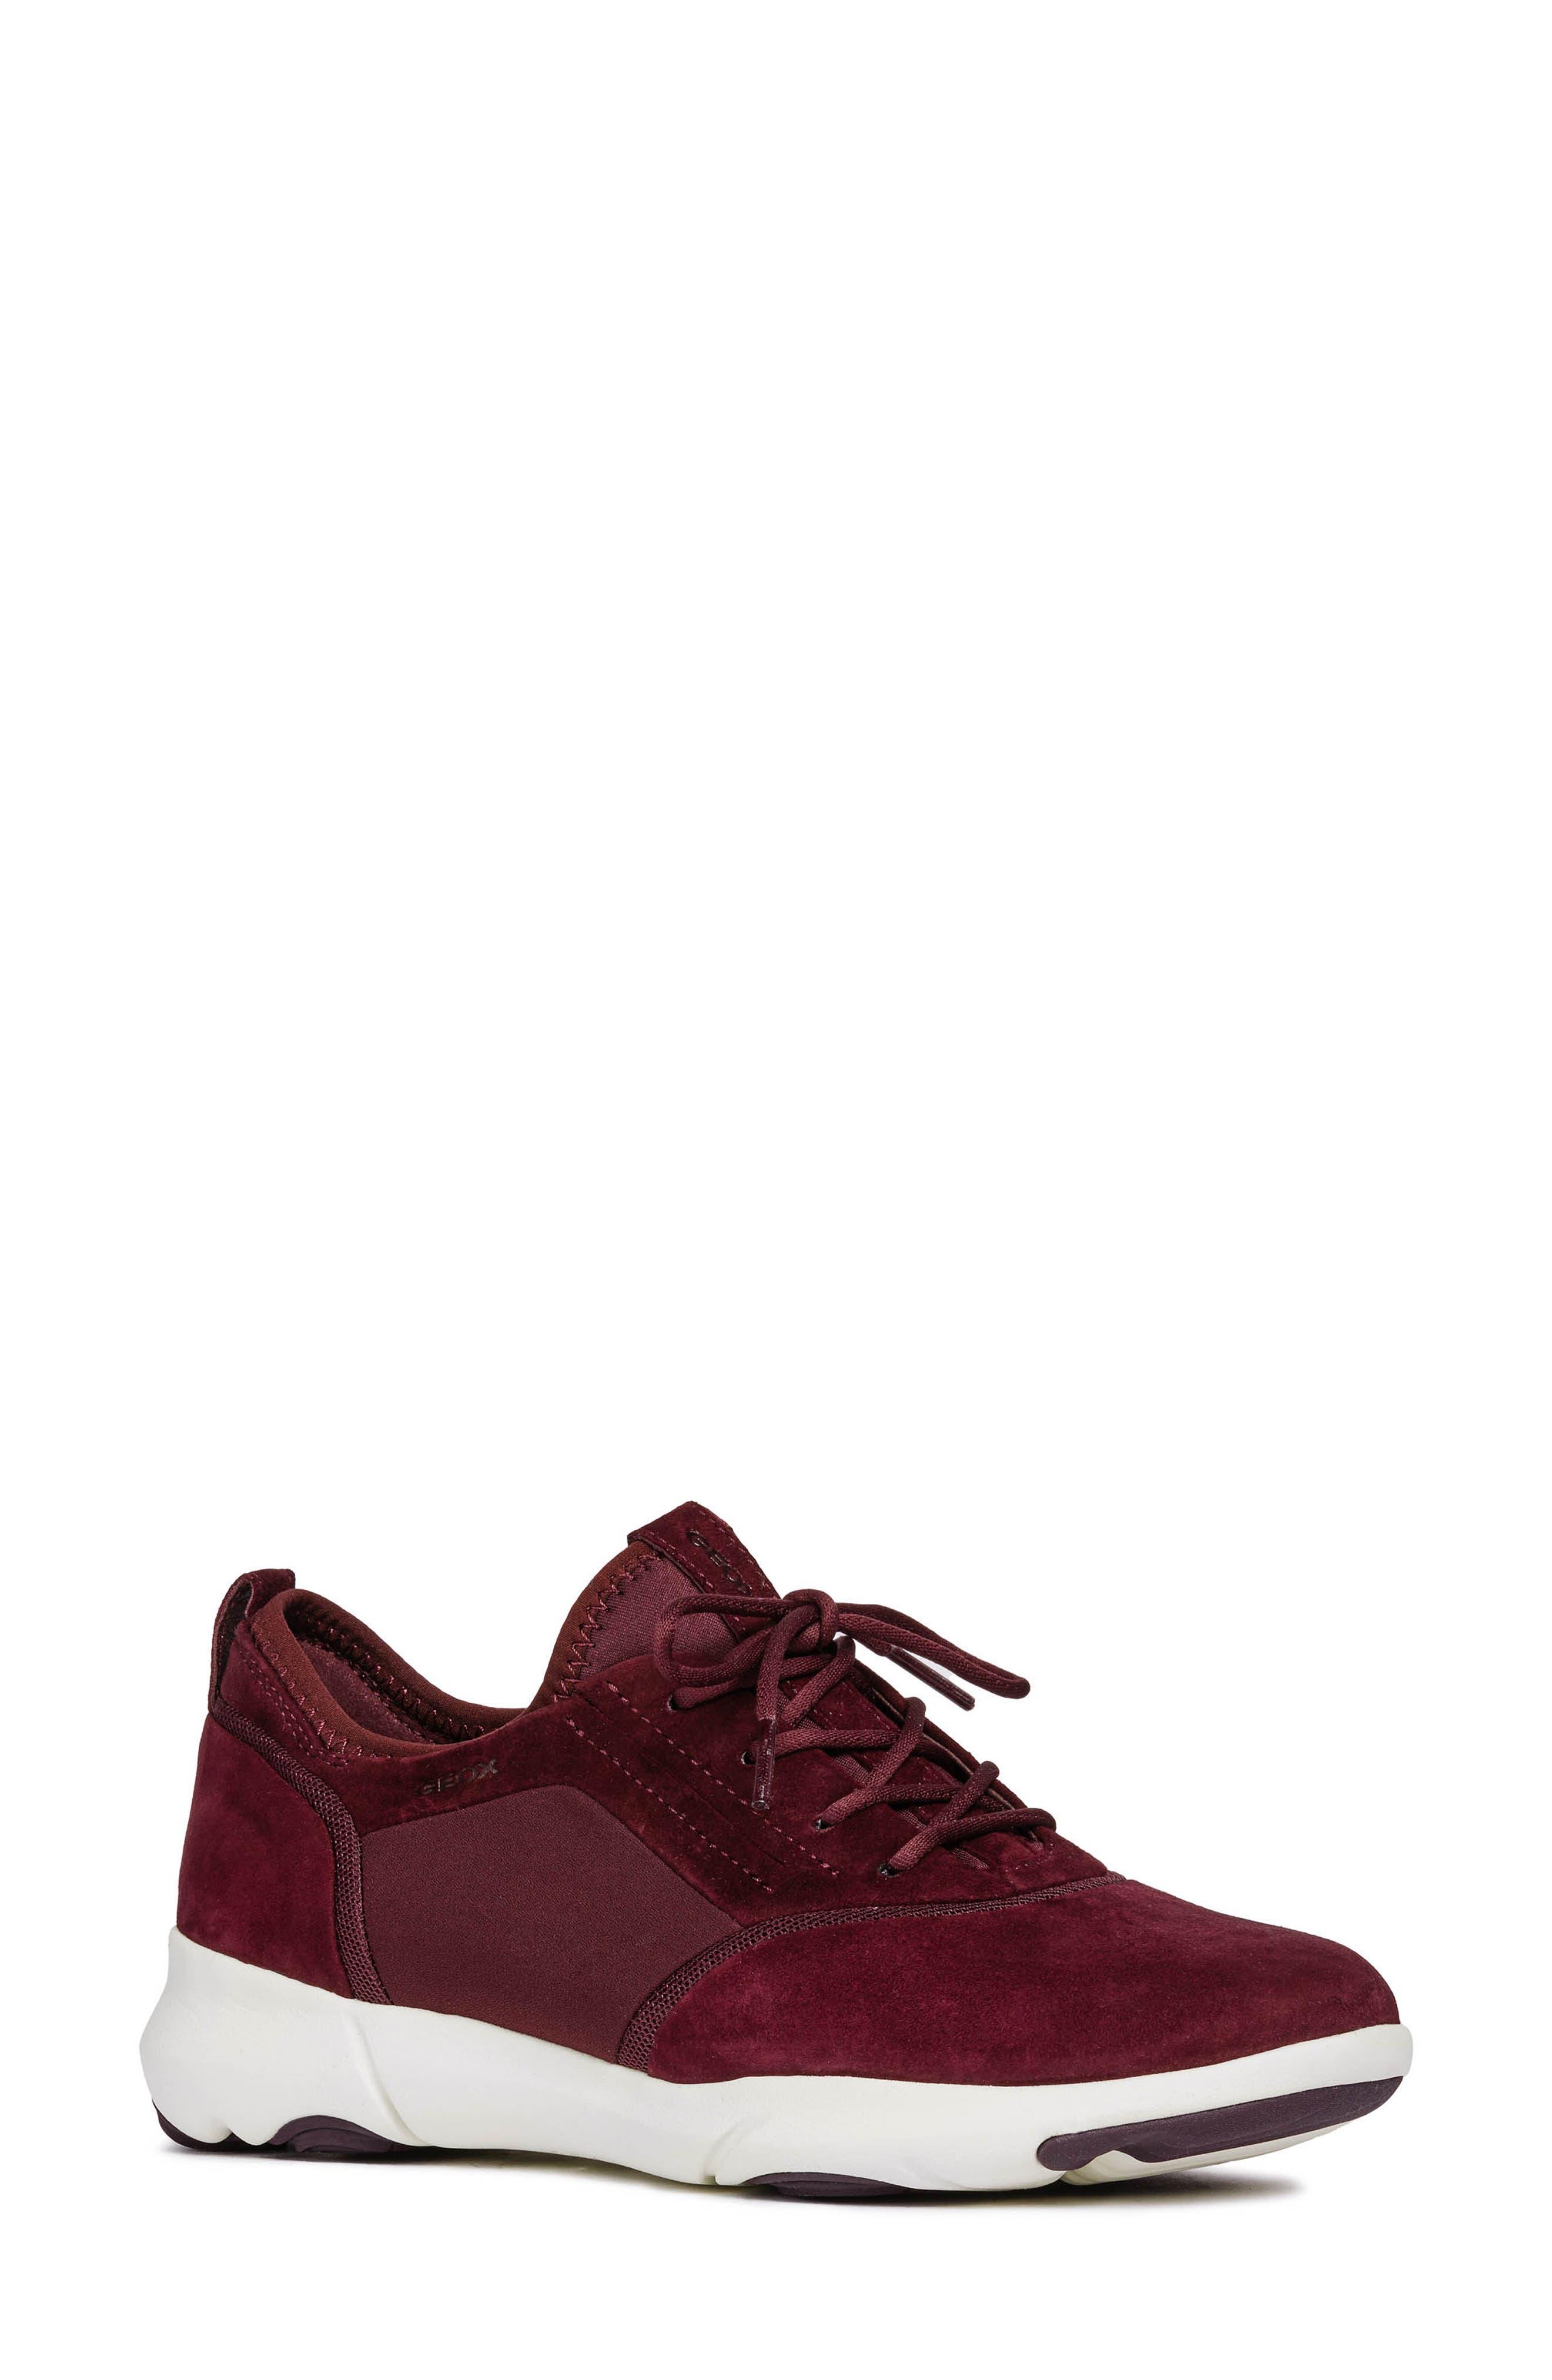 Nebula Sneaker,                         Main,                         color, DARK BURGUNDY LEATHER